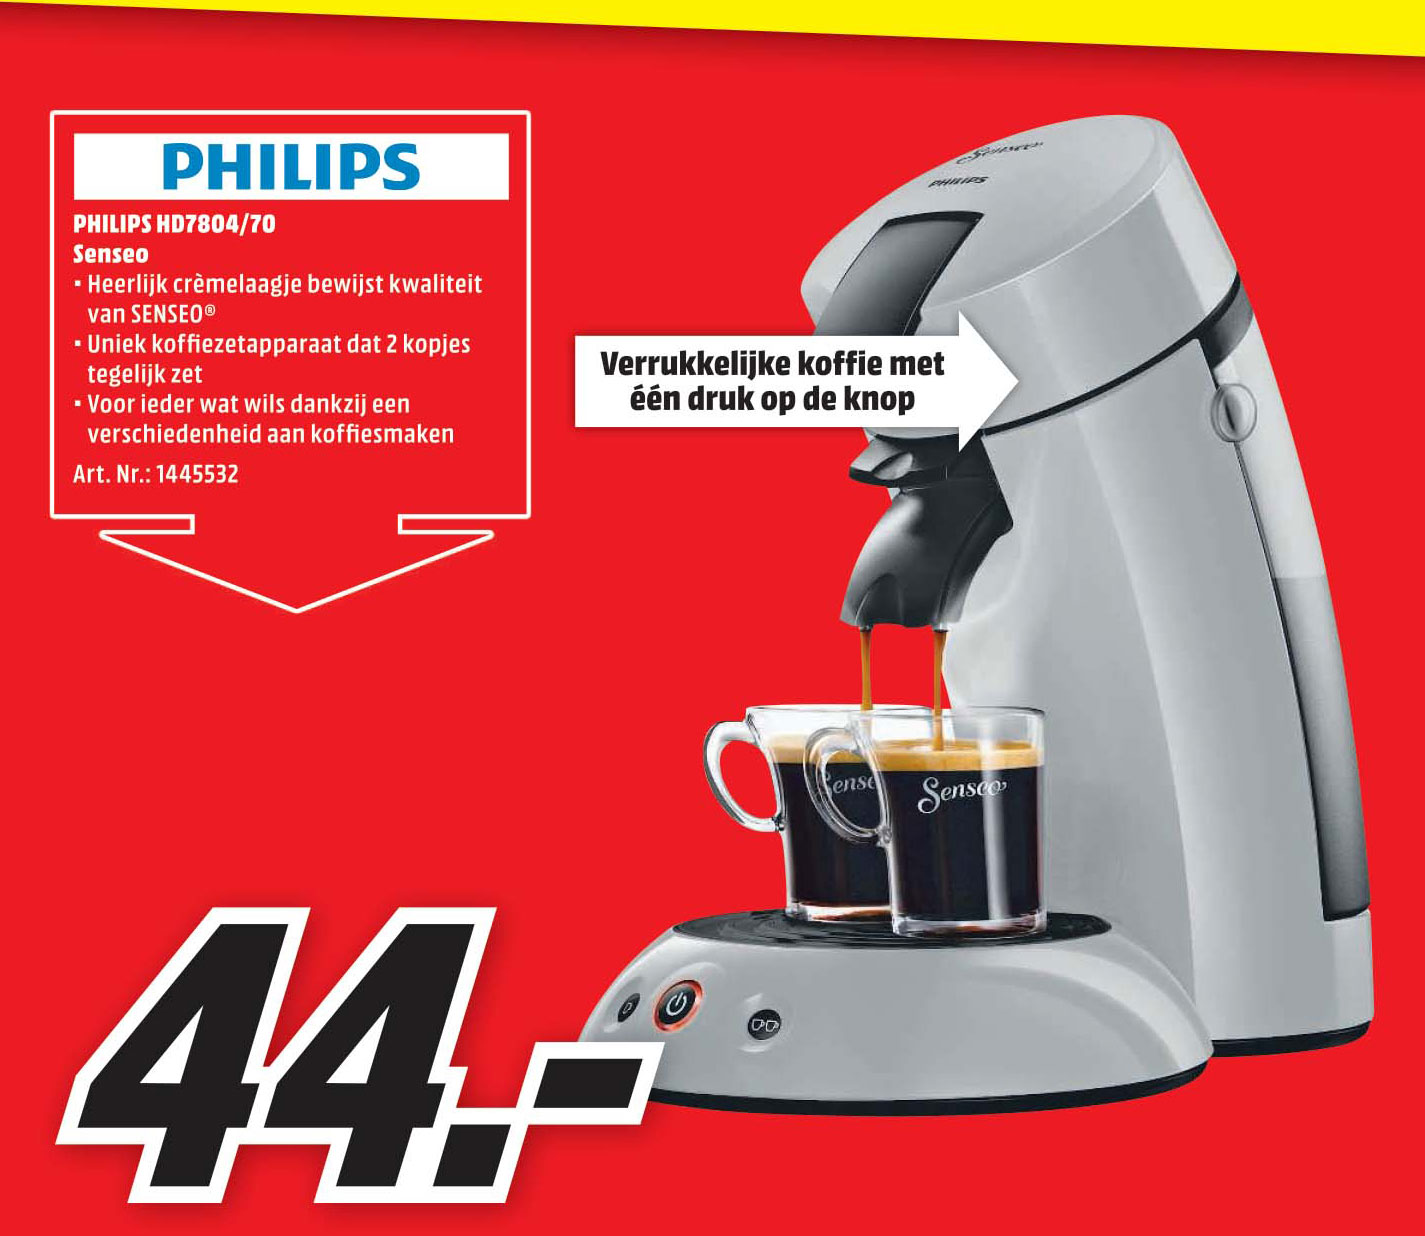 MediaMarkt Philips HD7804-70 Senseo